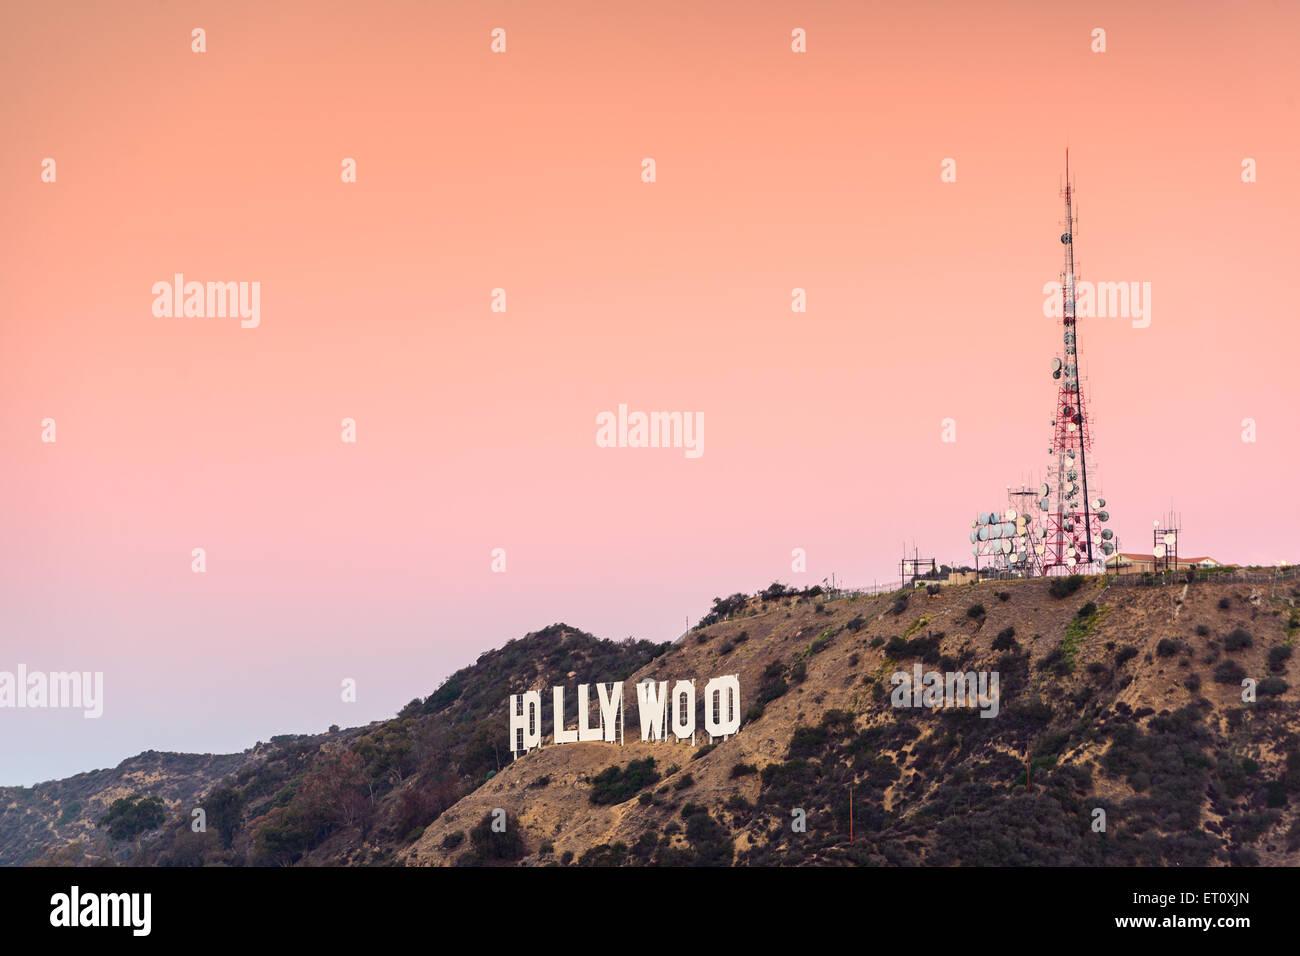 LOS ANGELES, CALIFORNIA - NOVEMBER 6, 2013: Hollywood sign in Los Angeles, California. The landmark sign dates from - Stock Image